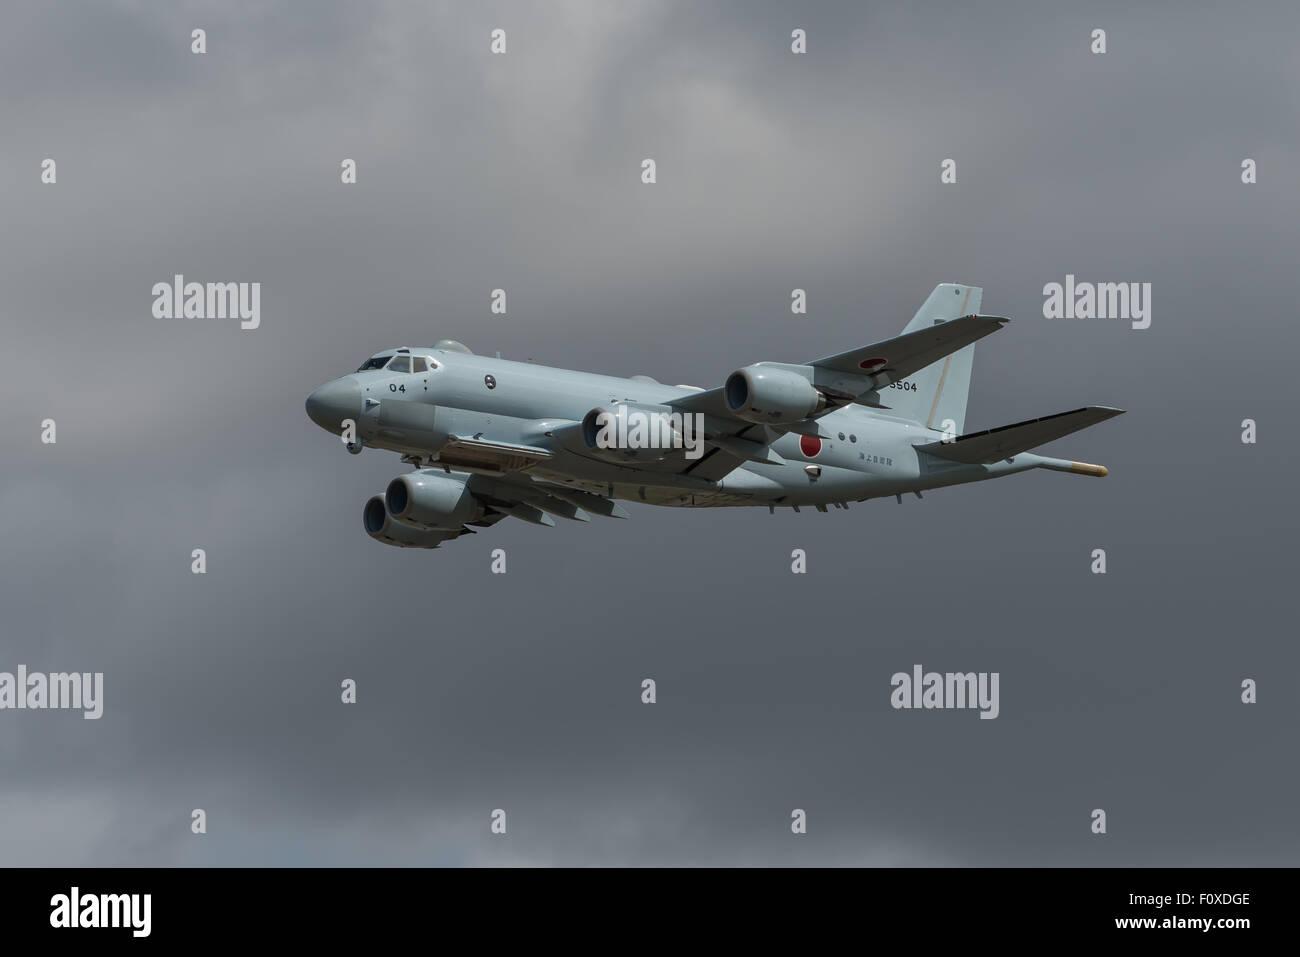 Japanese P1 Maritime Patrol Aircraft - Stock Image